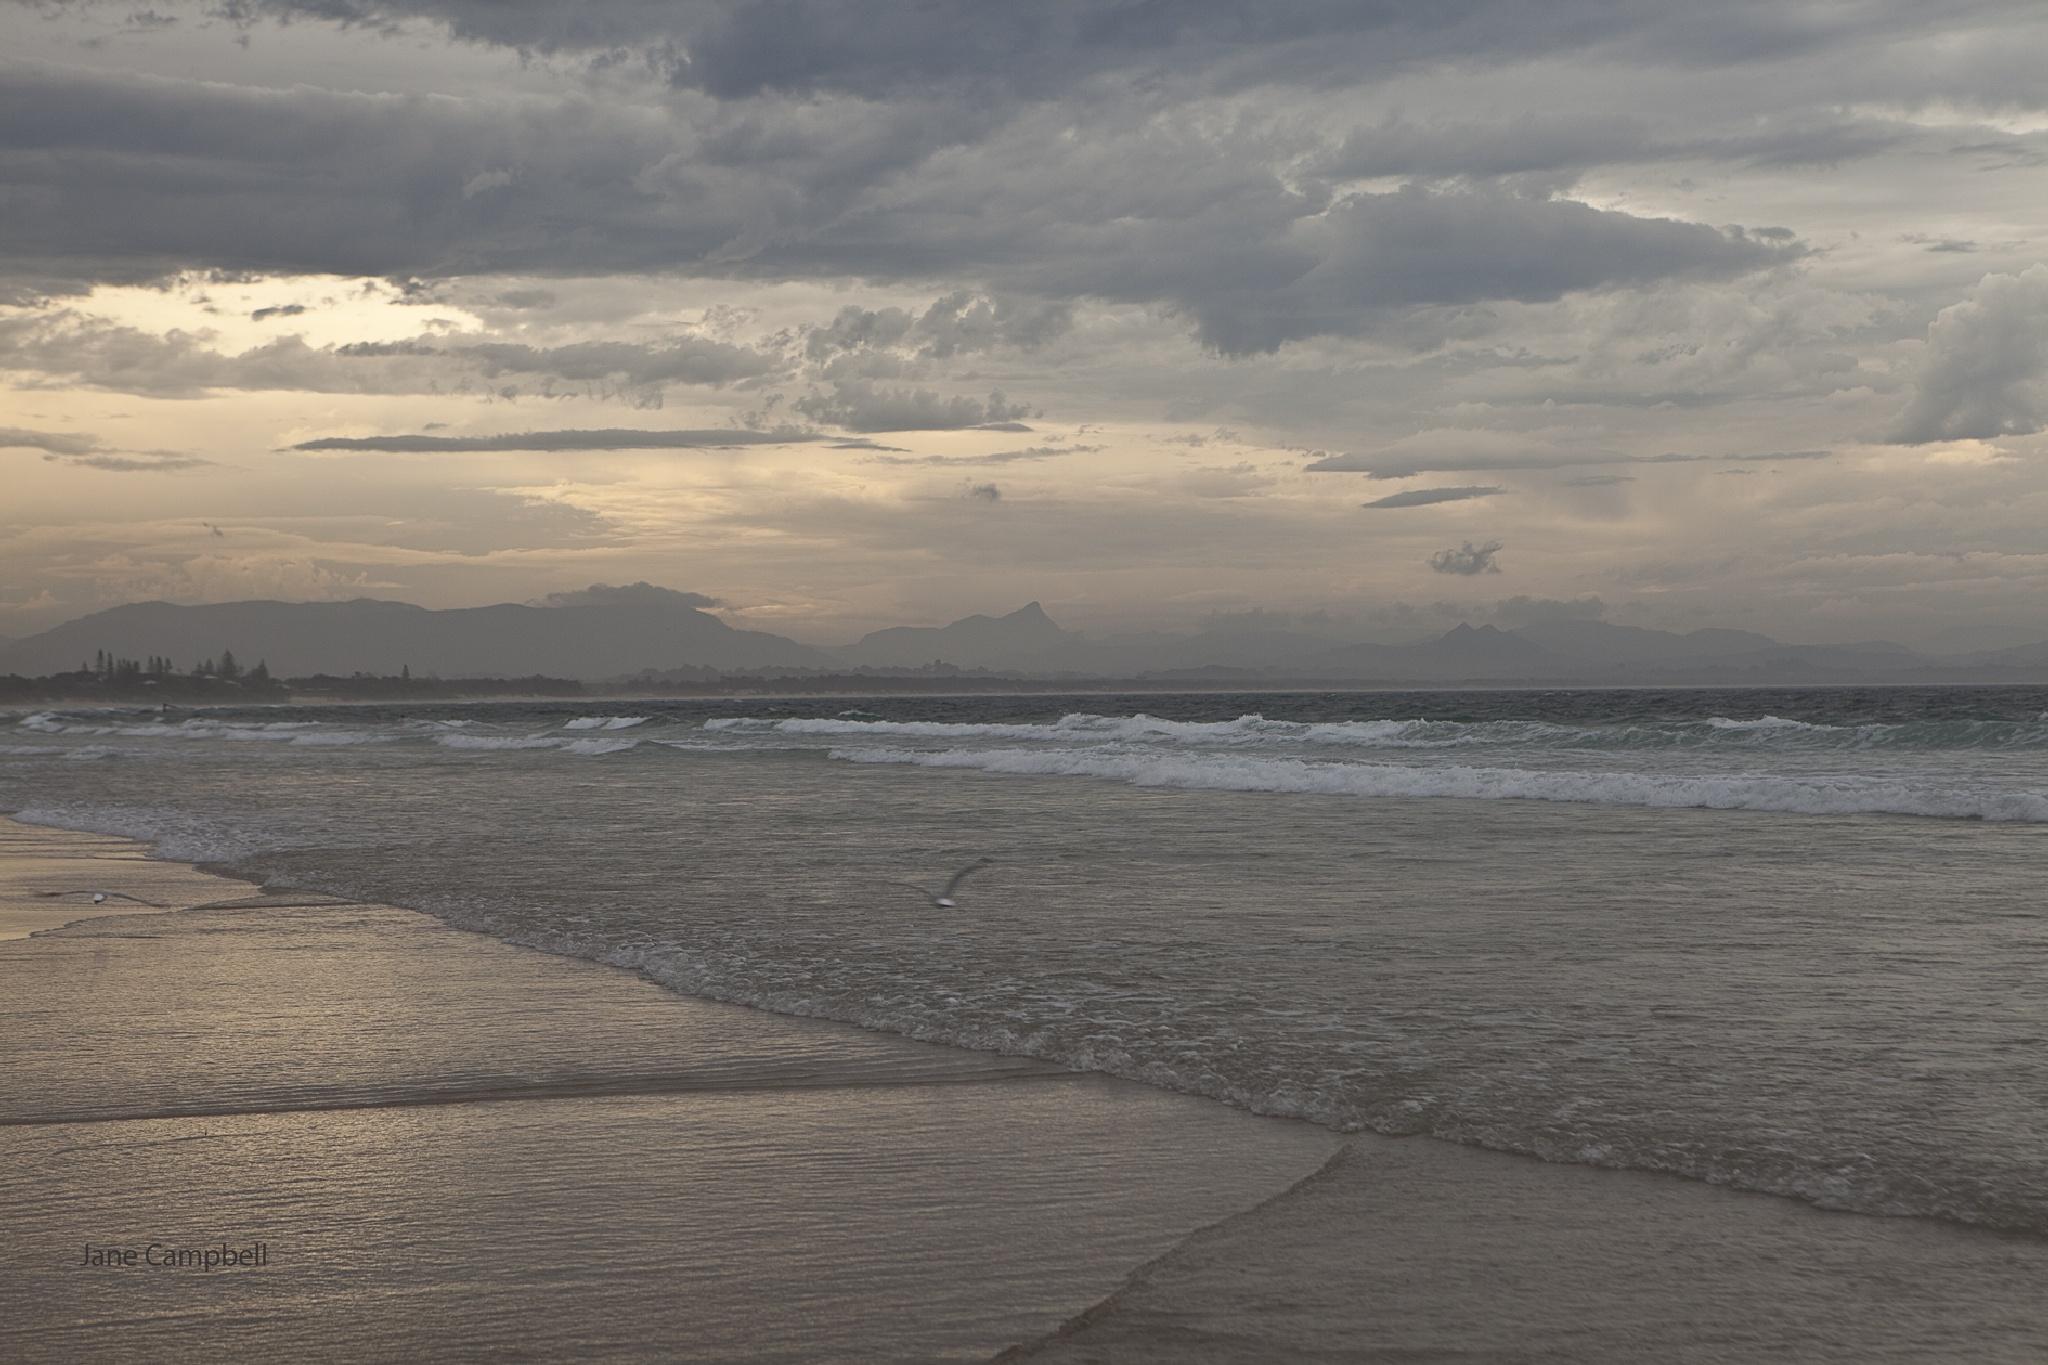 Byron Bay, Australia - Sunrise by JaneCampbell21